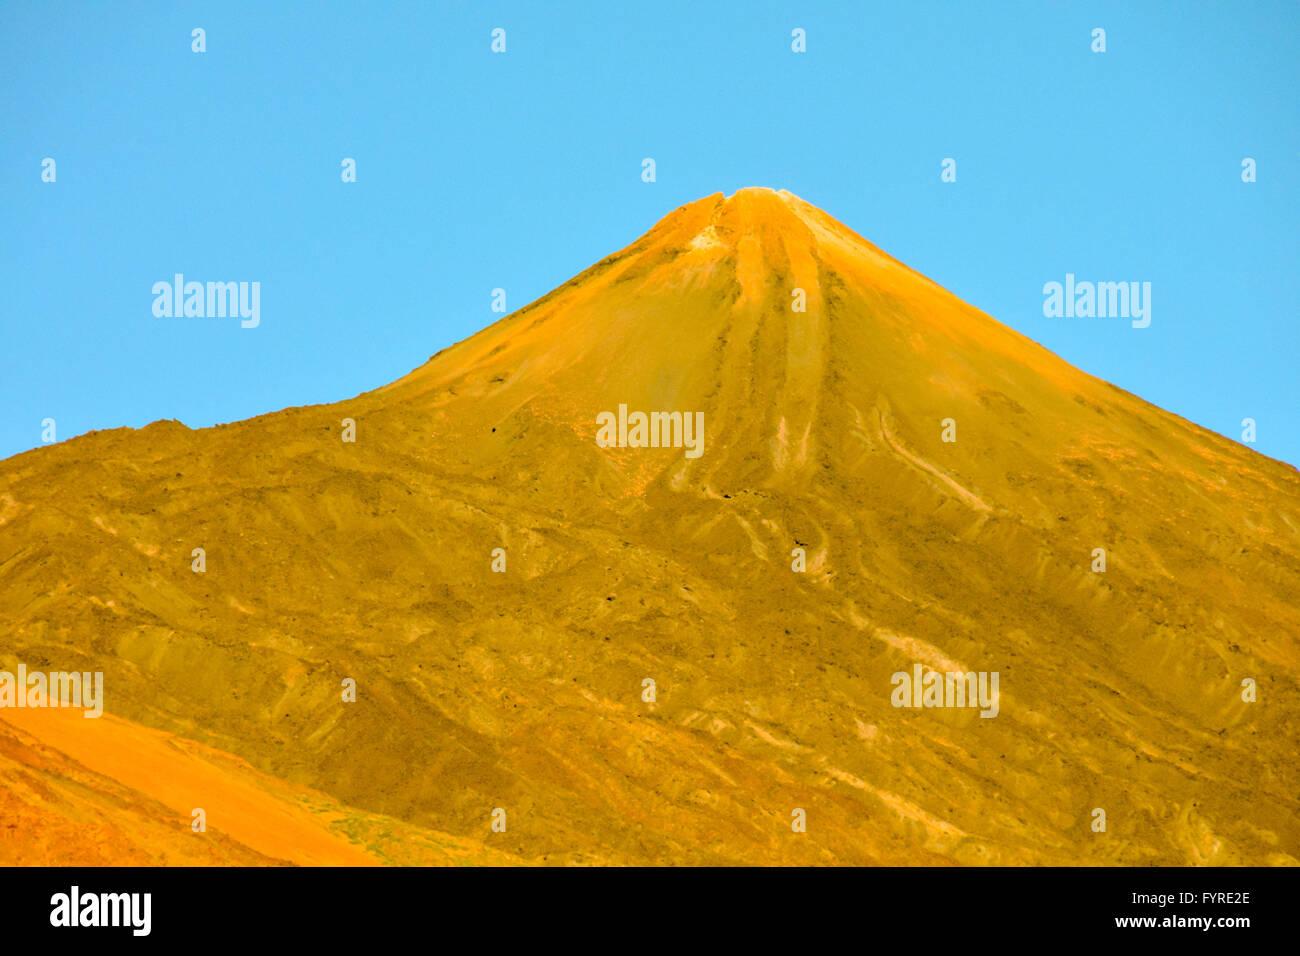 Volcan Basaltic Mountain - Stock Image